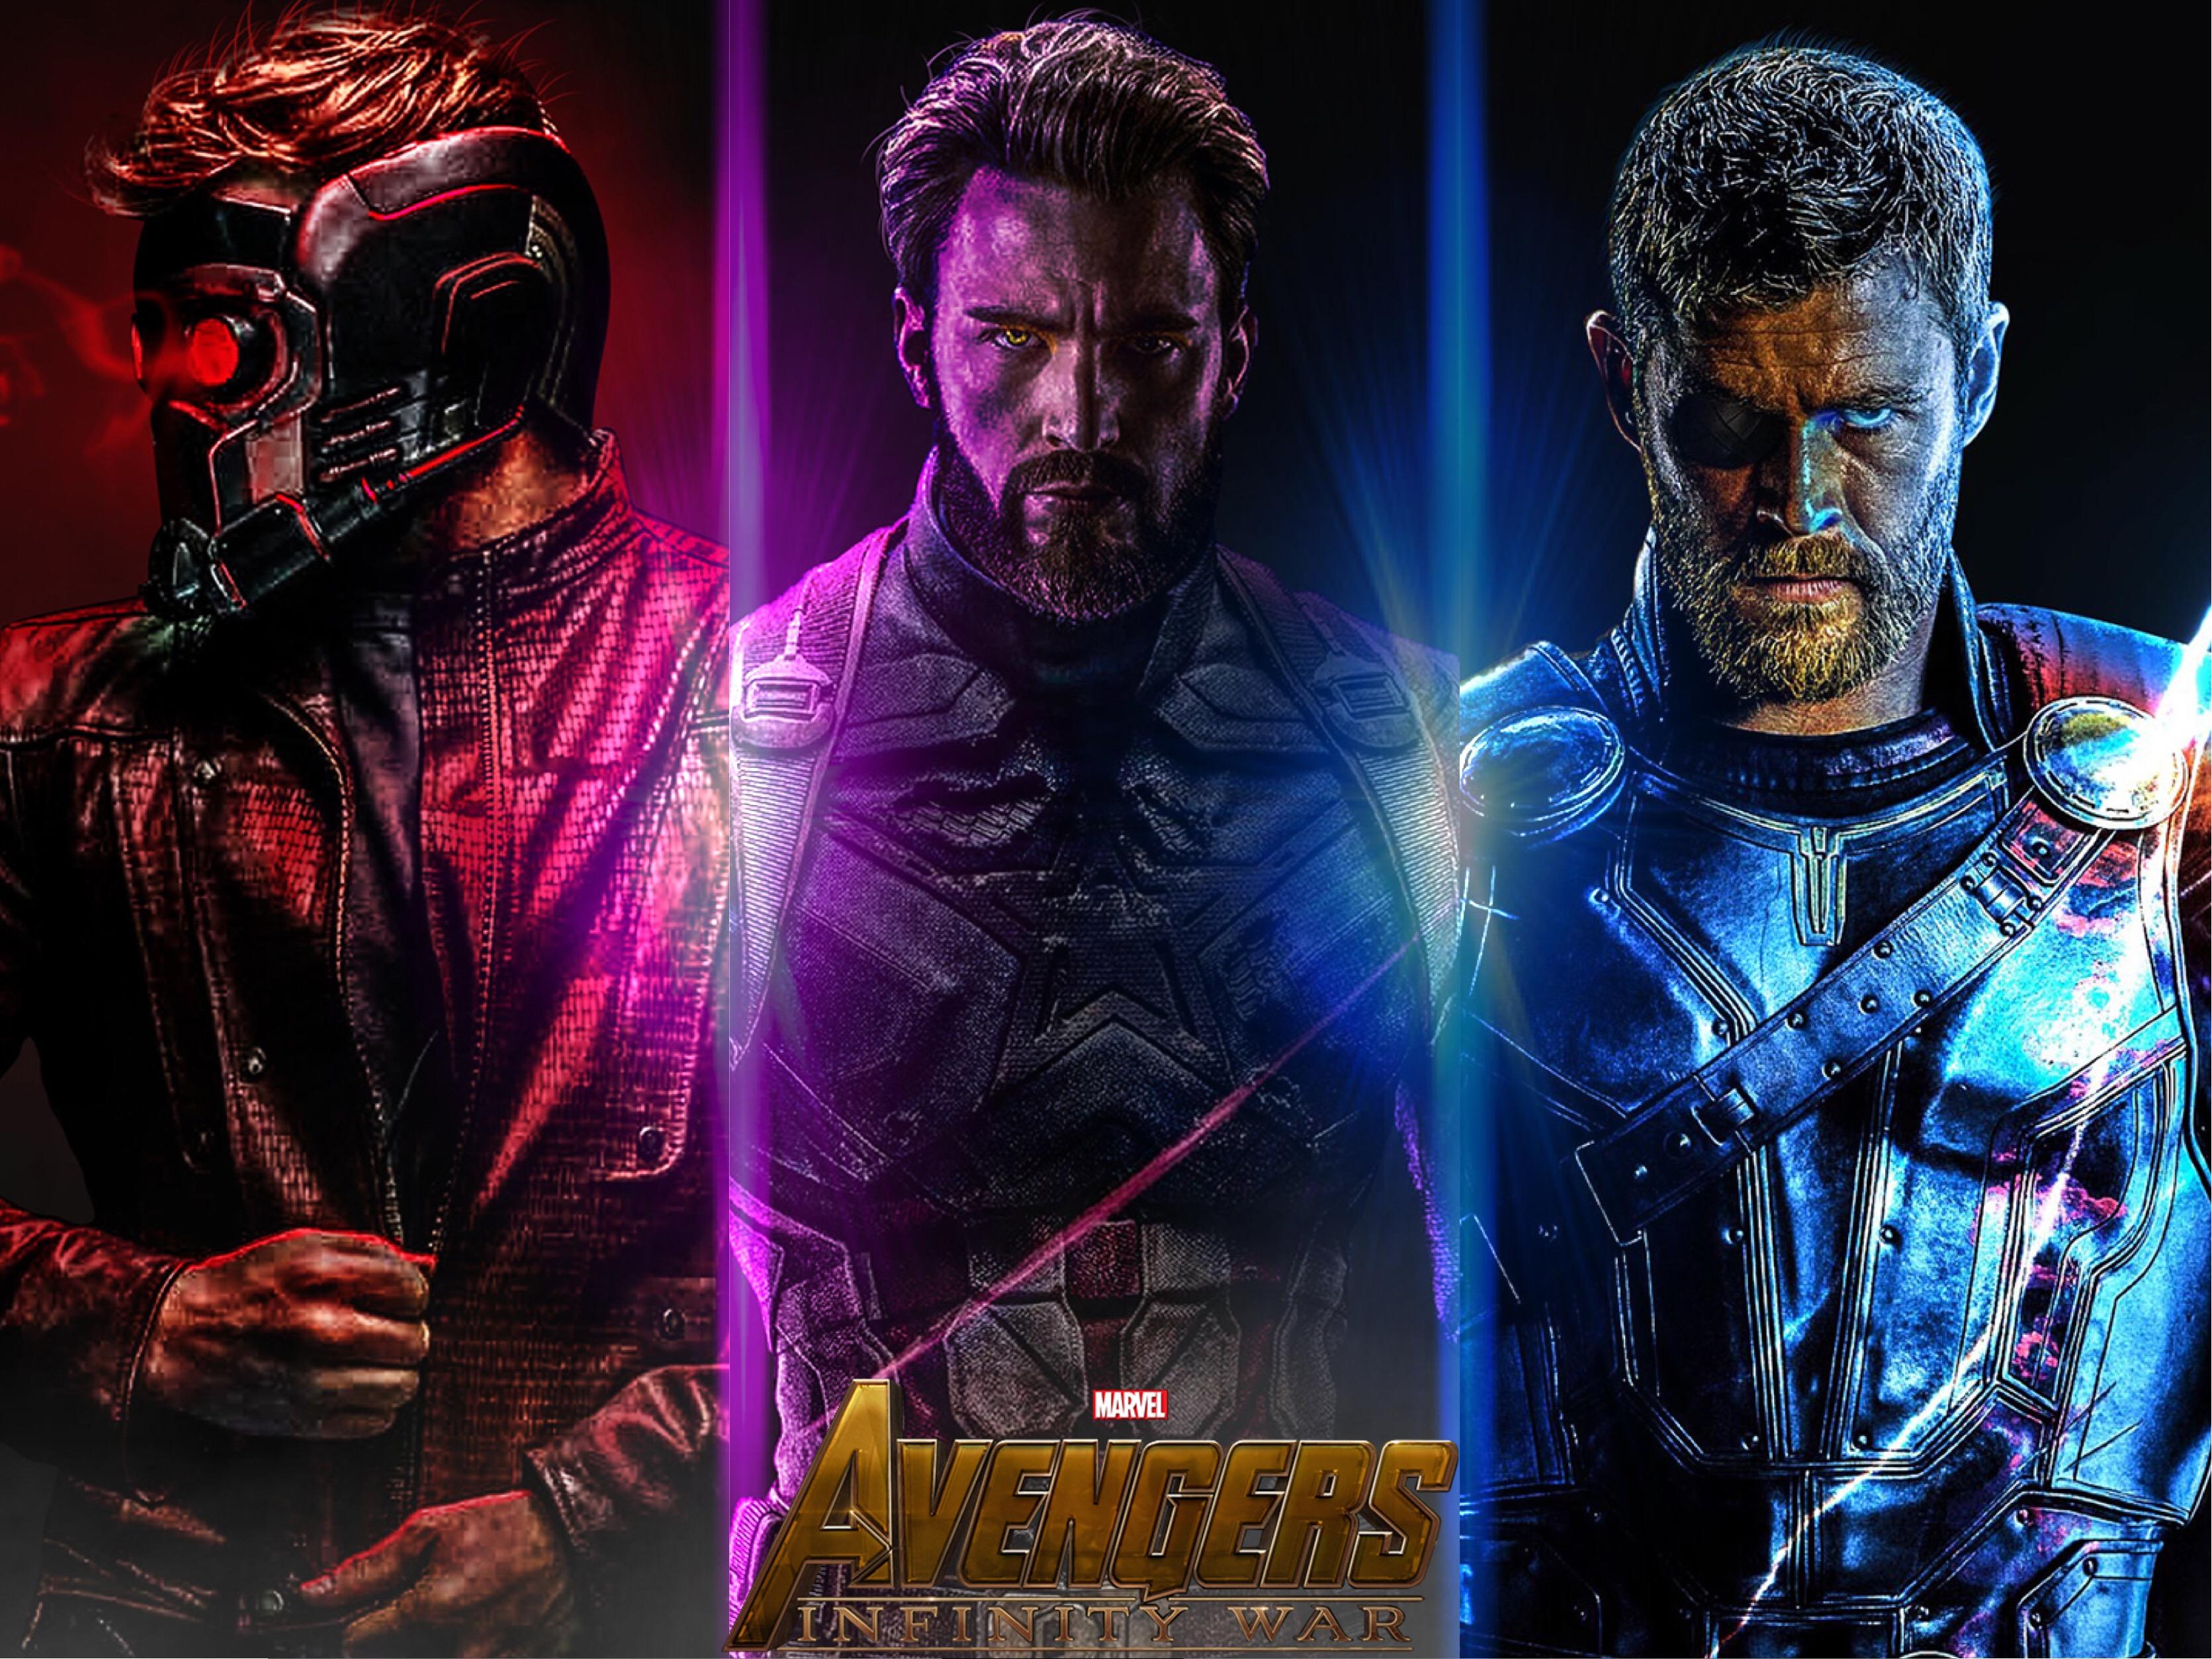 Captain America Hd Wallpaper Infinity War Many Hd Wallpaper